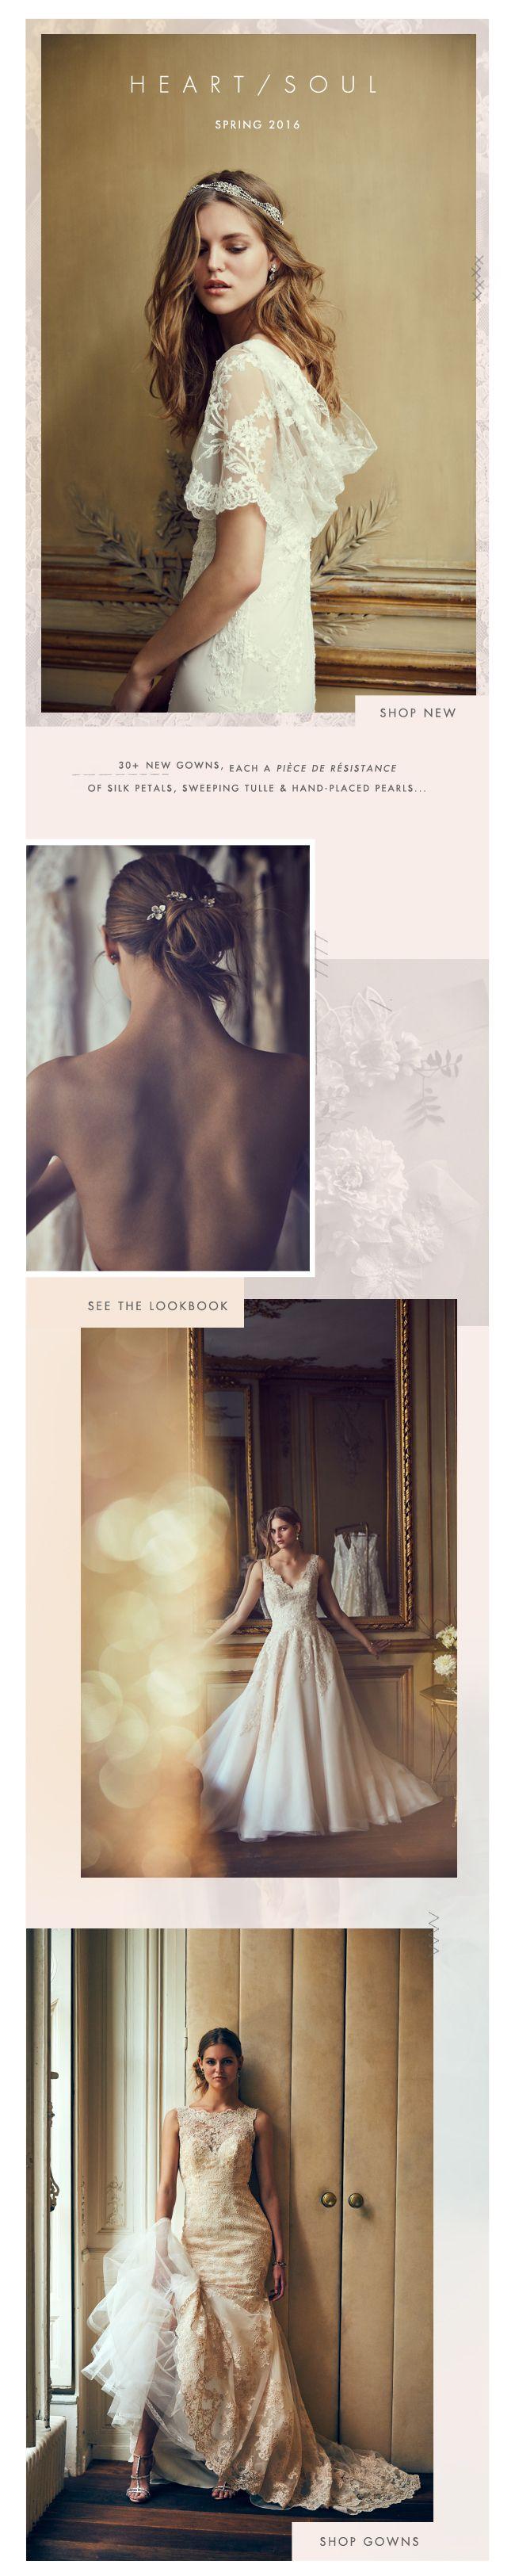 BHLDN | Anthropologie Weddings | Atelier | Gowns | Email Design